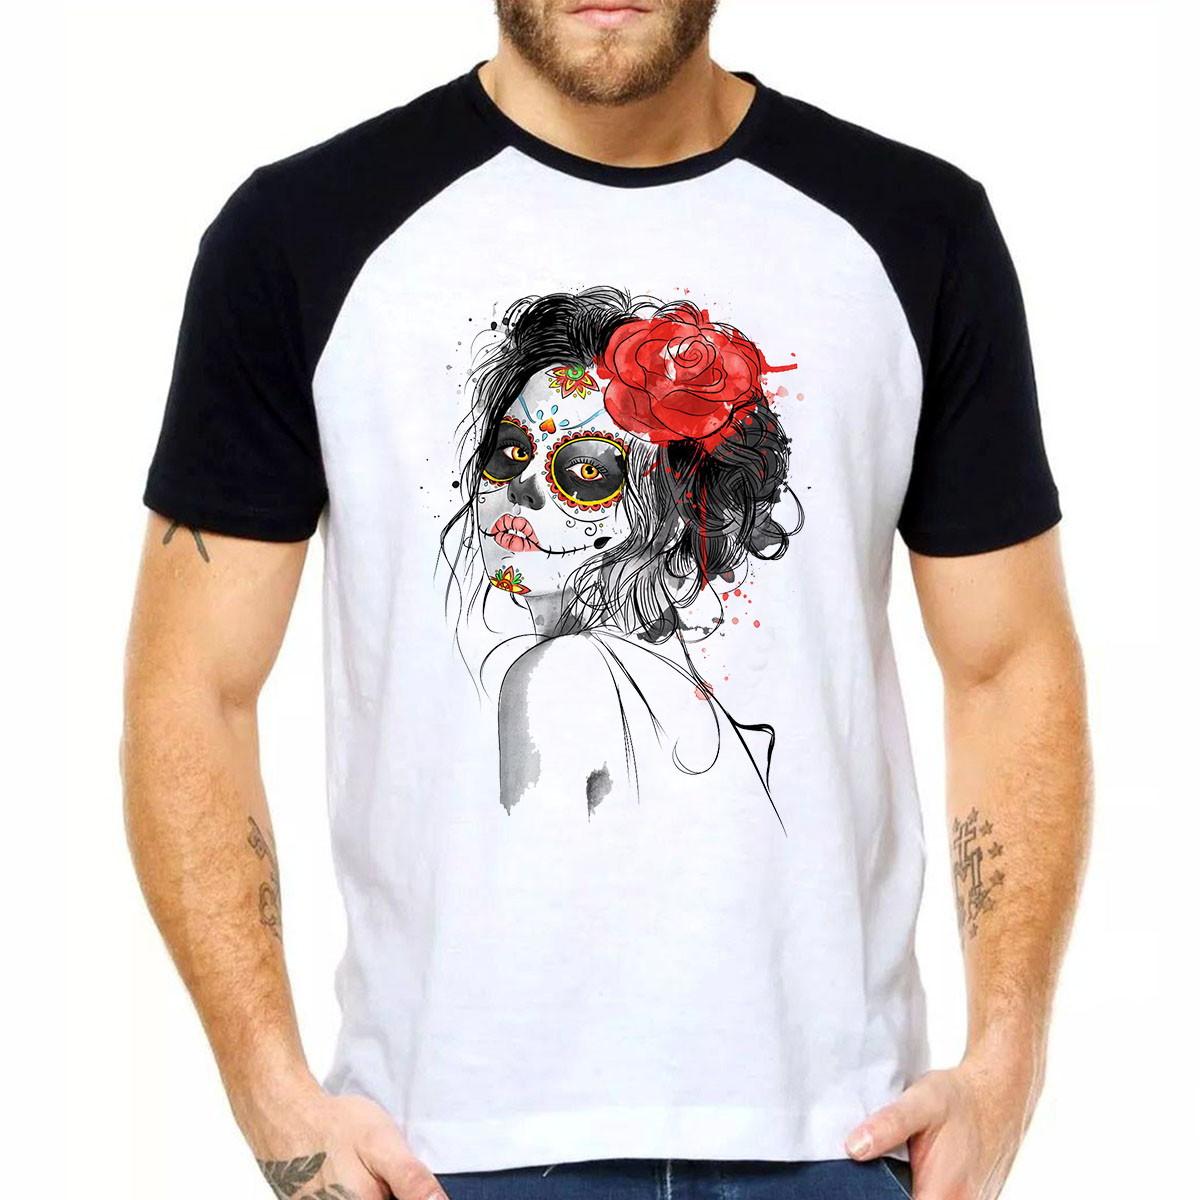 Camiseta Masculina Woman Red Mulher Flor Skull Caveira Skull no Elo7 ... 118299ac39a